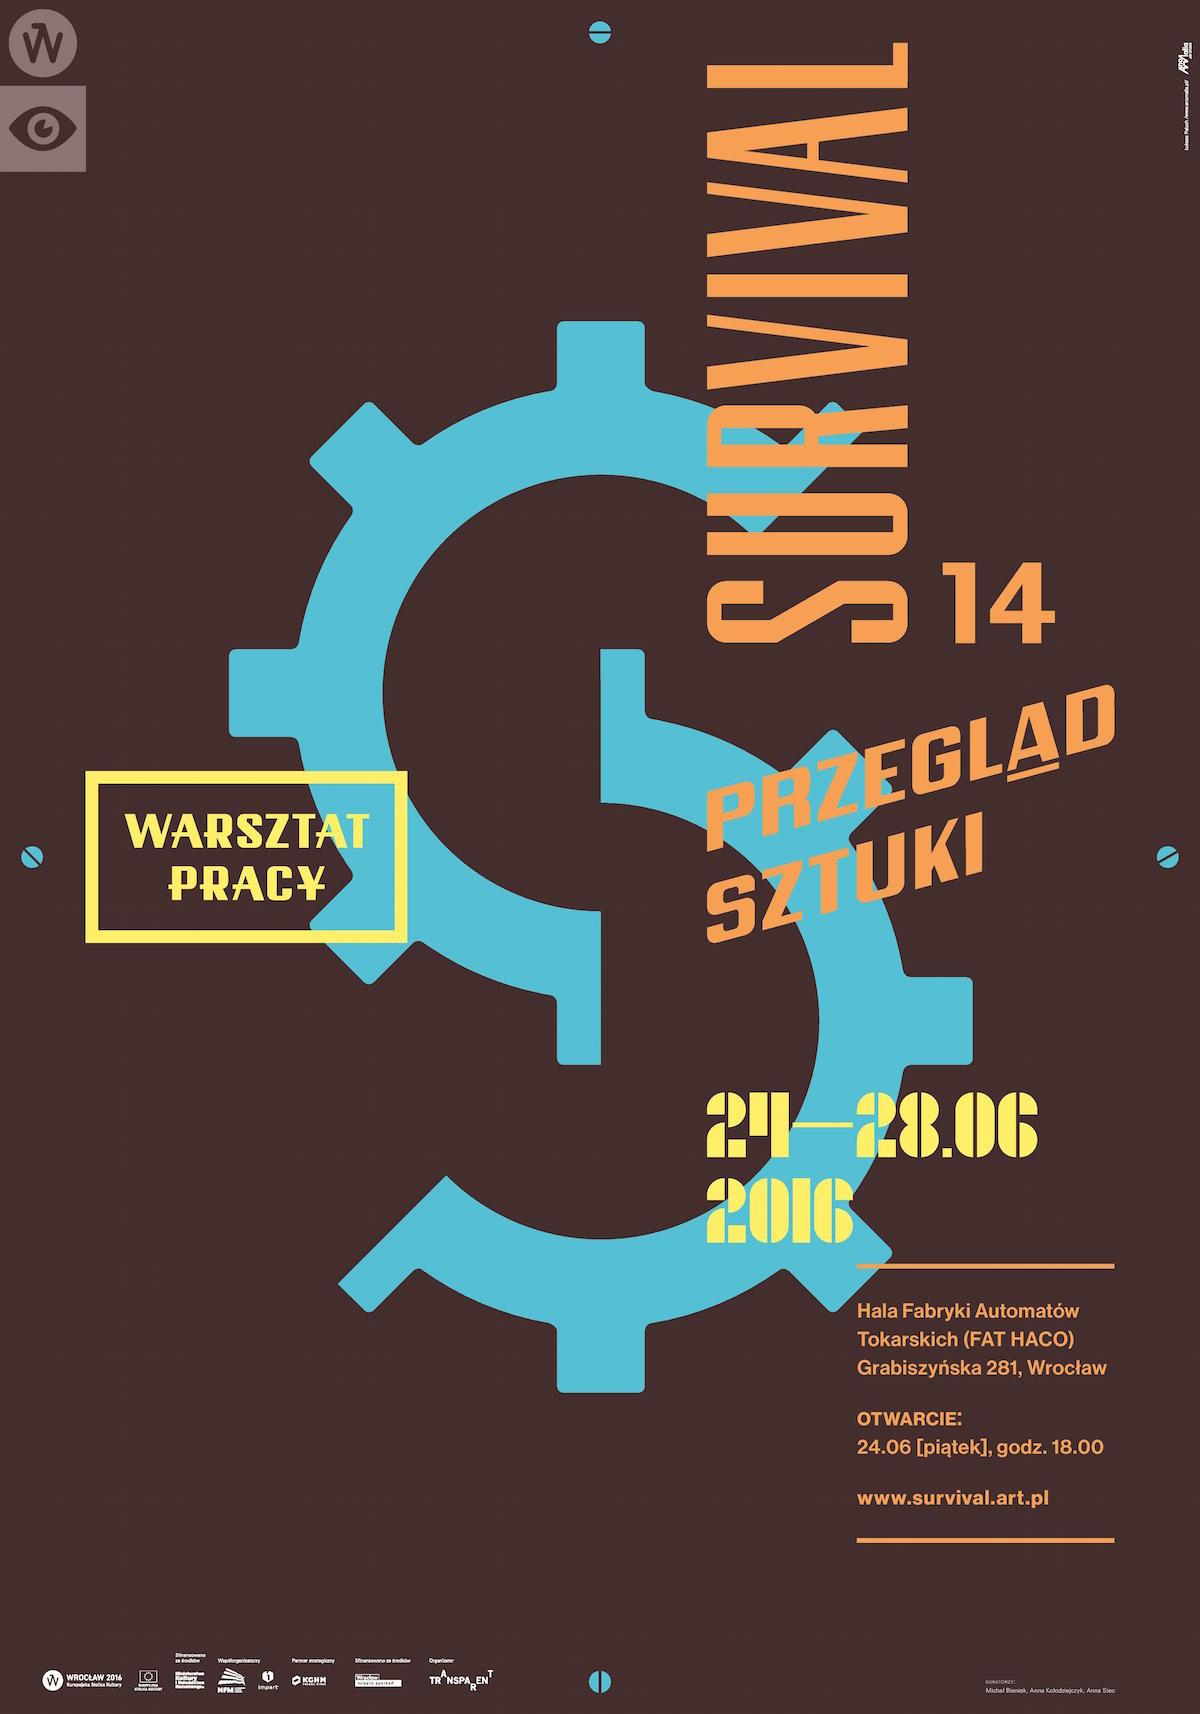 14. Przegląd Sztuki SURVIVAL – plakat (źródło: materiały prasowe organizatora)